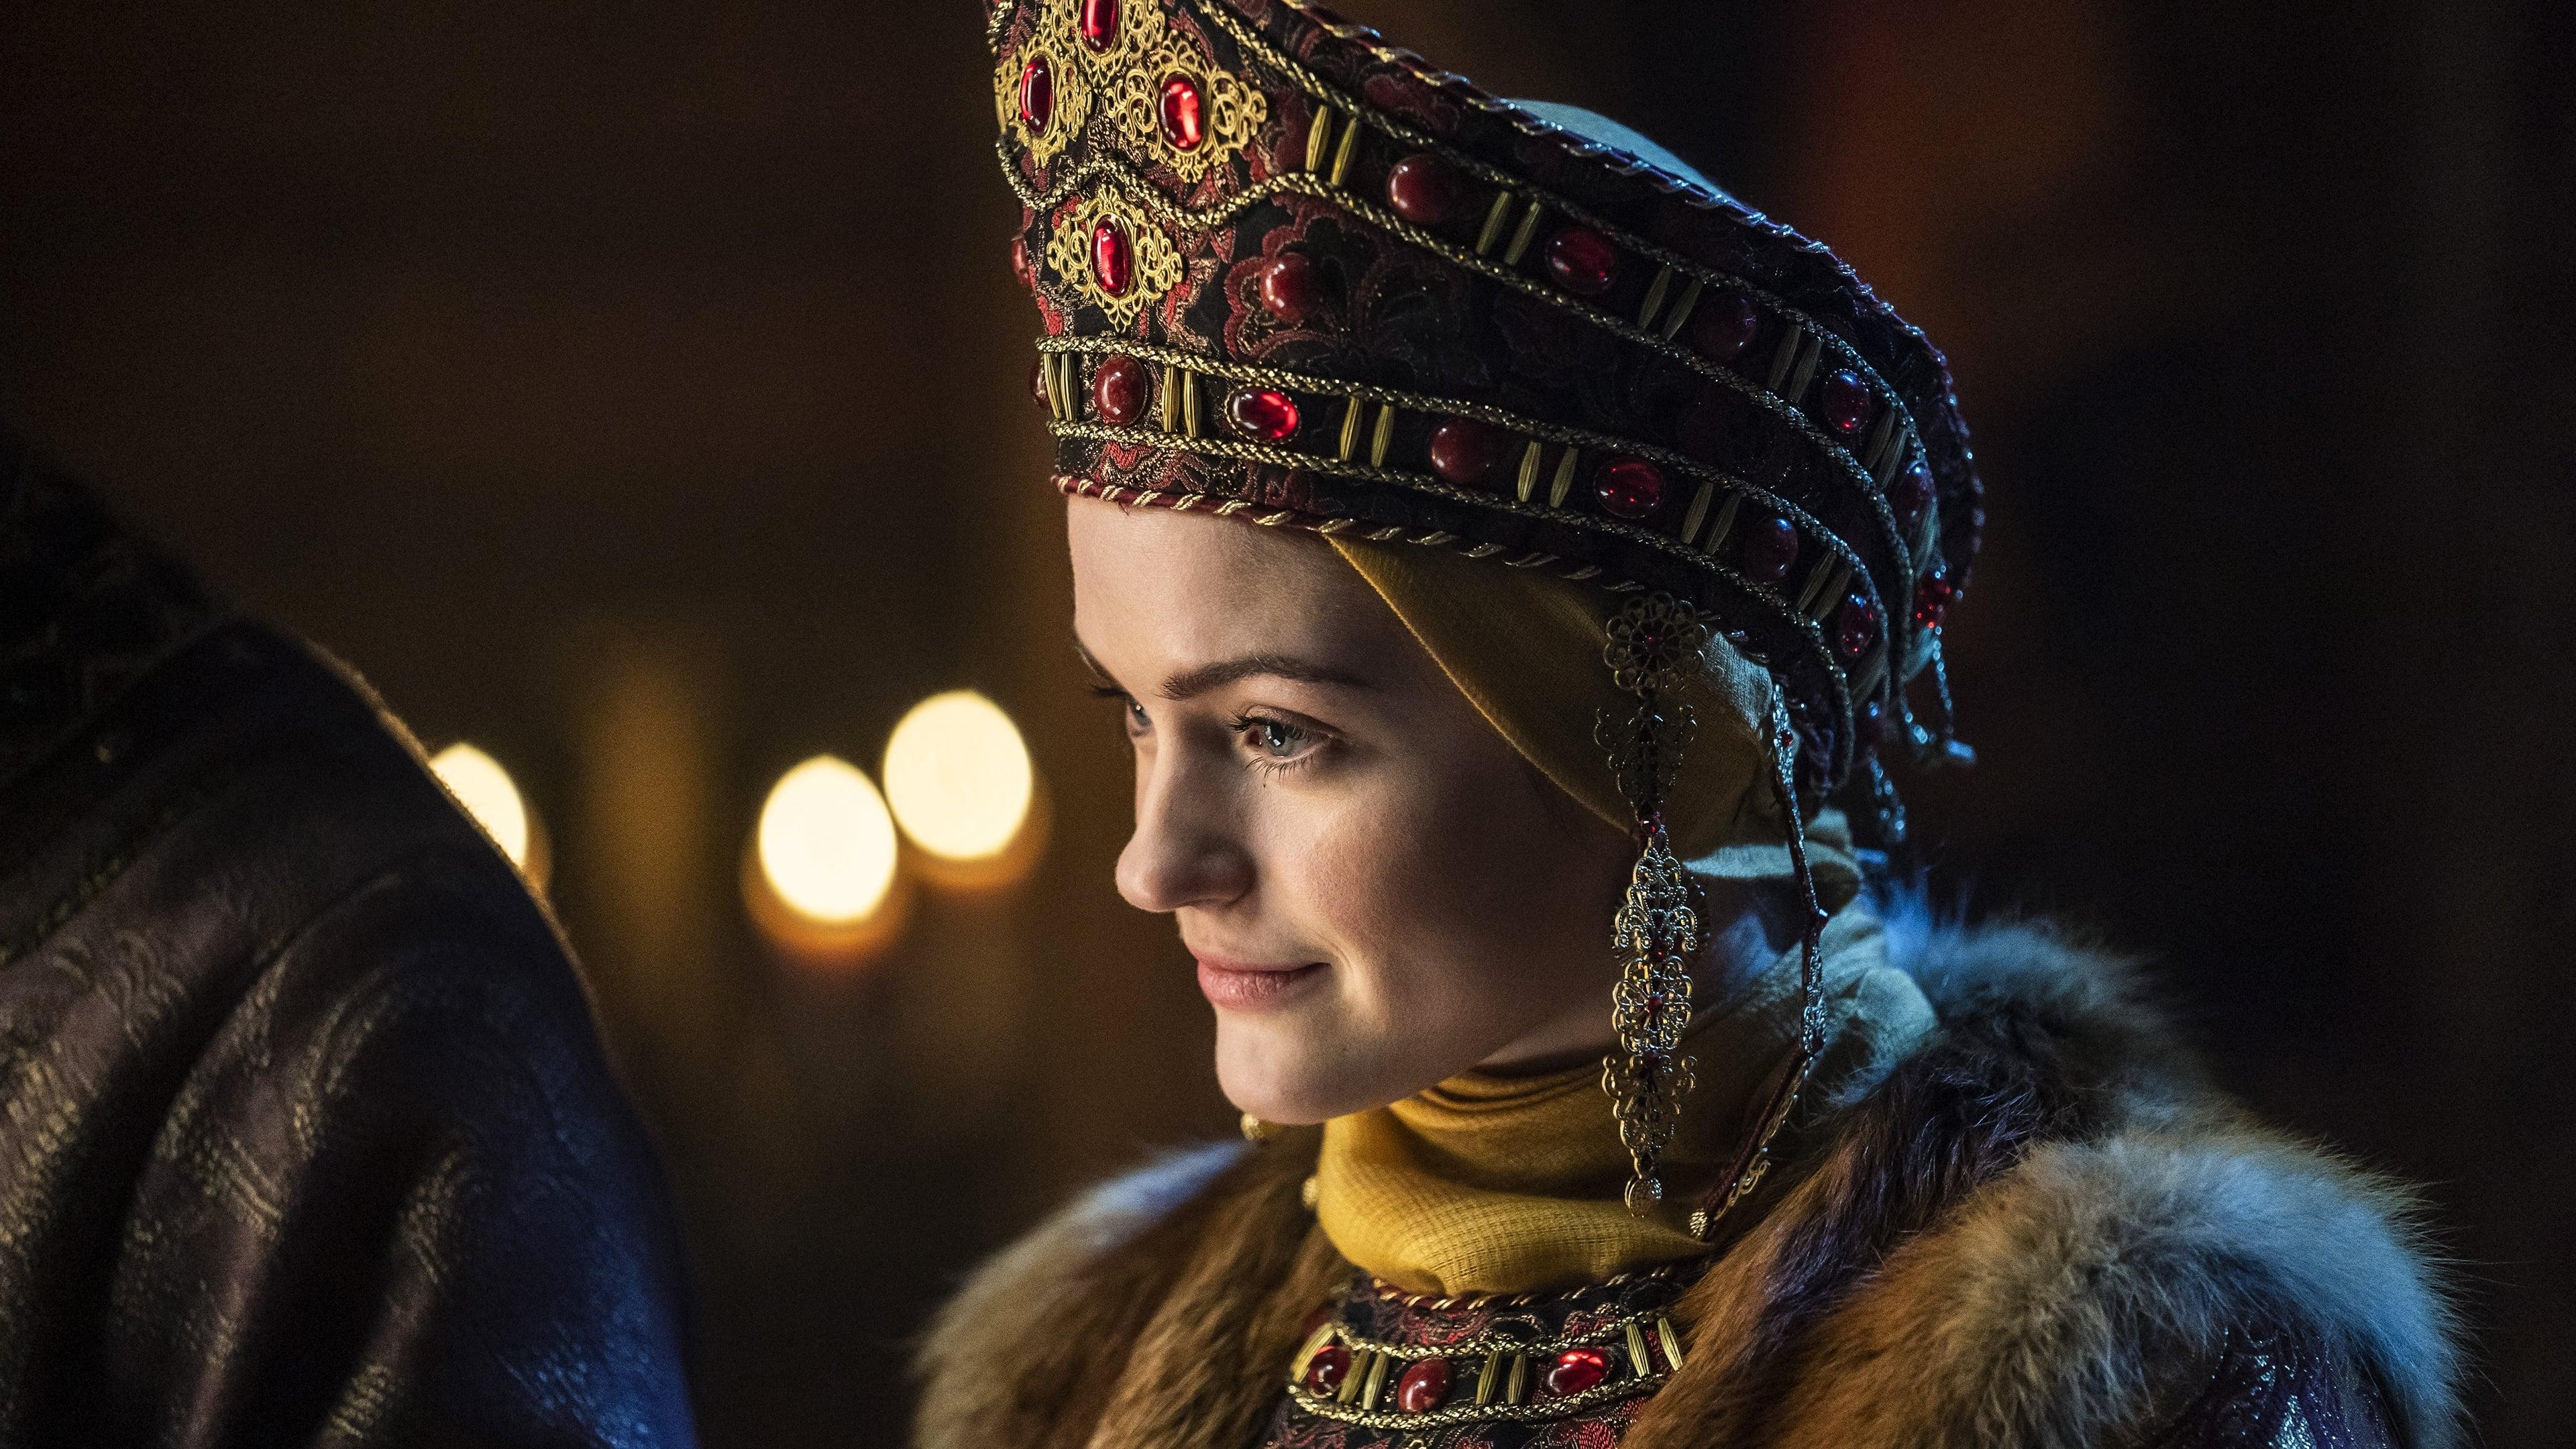 Vikings - Season 6 Episode 5 : The Key